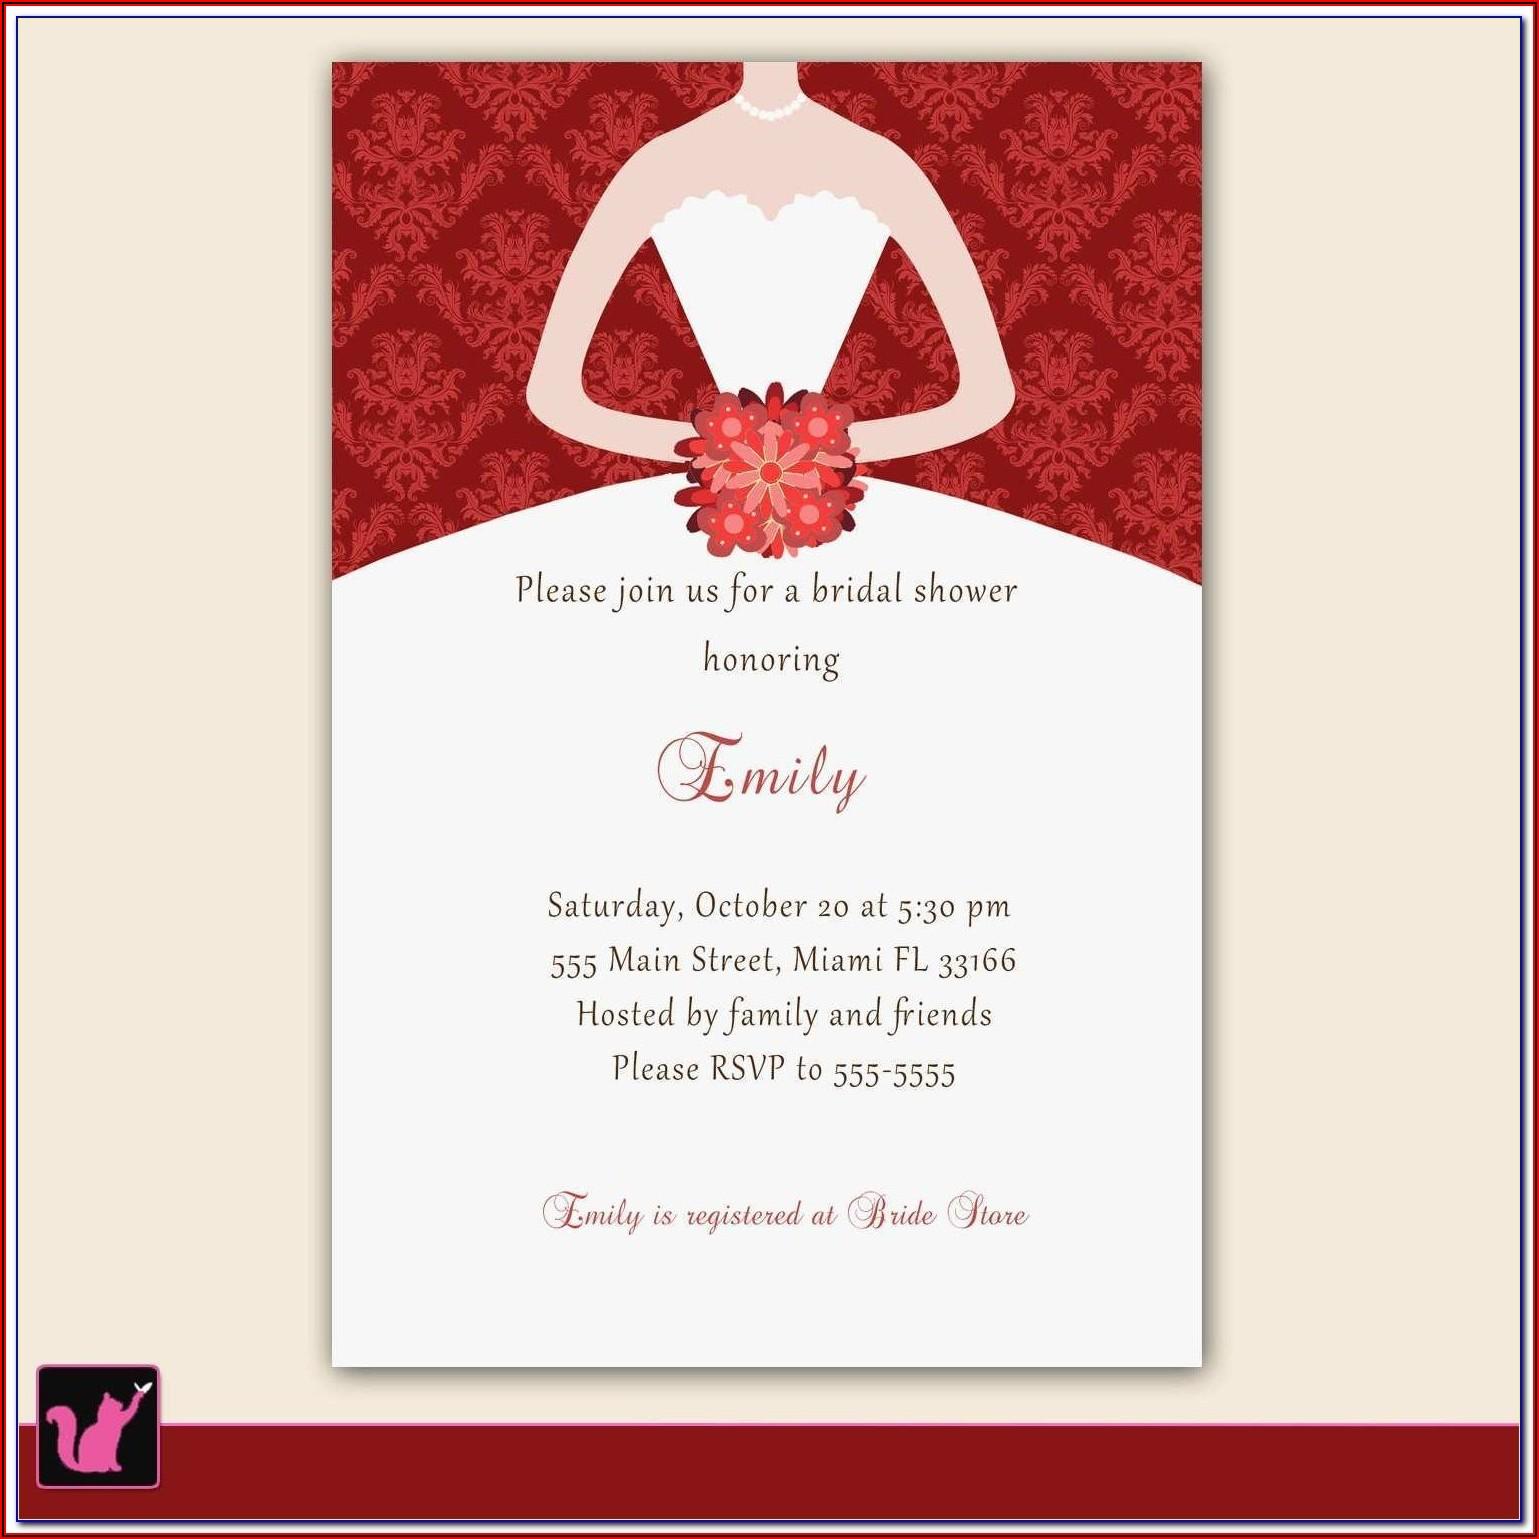 Free Catholic Wedding Invitation Templates